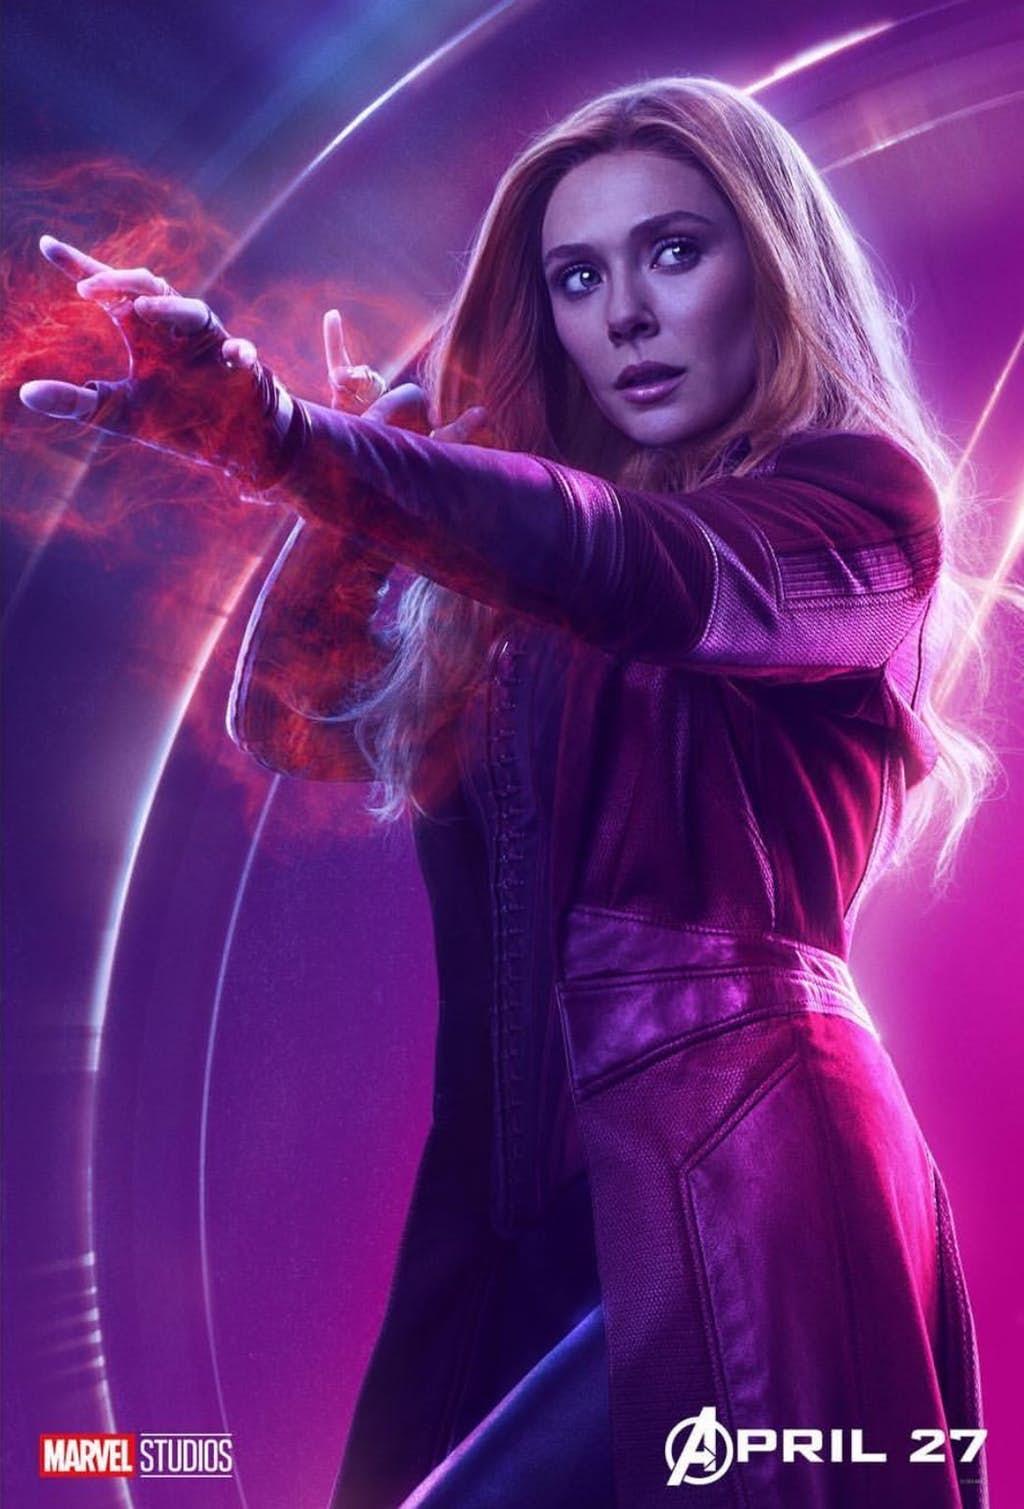 Elizabeth Olsen Doesn't Want a Solo Scarlet Witch Movie